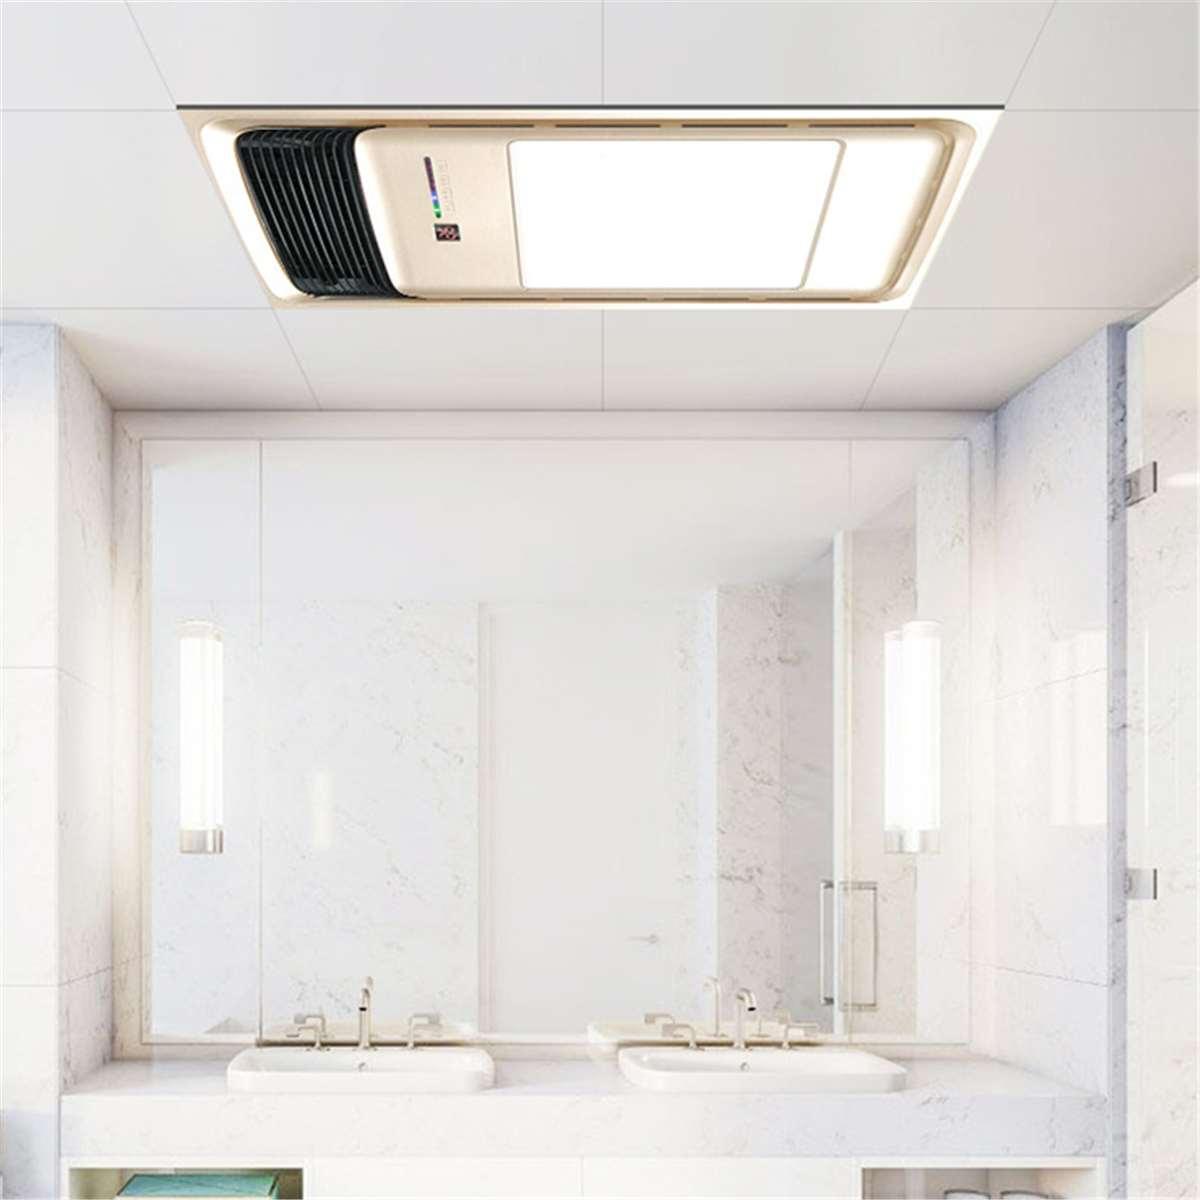 220V Bathroom Electric Heater Exhaust Fan Warmer Ceiling Lights Heating Winter Shower Livingroom Light Wall Mounted